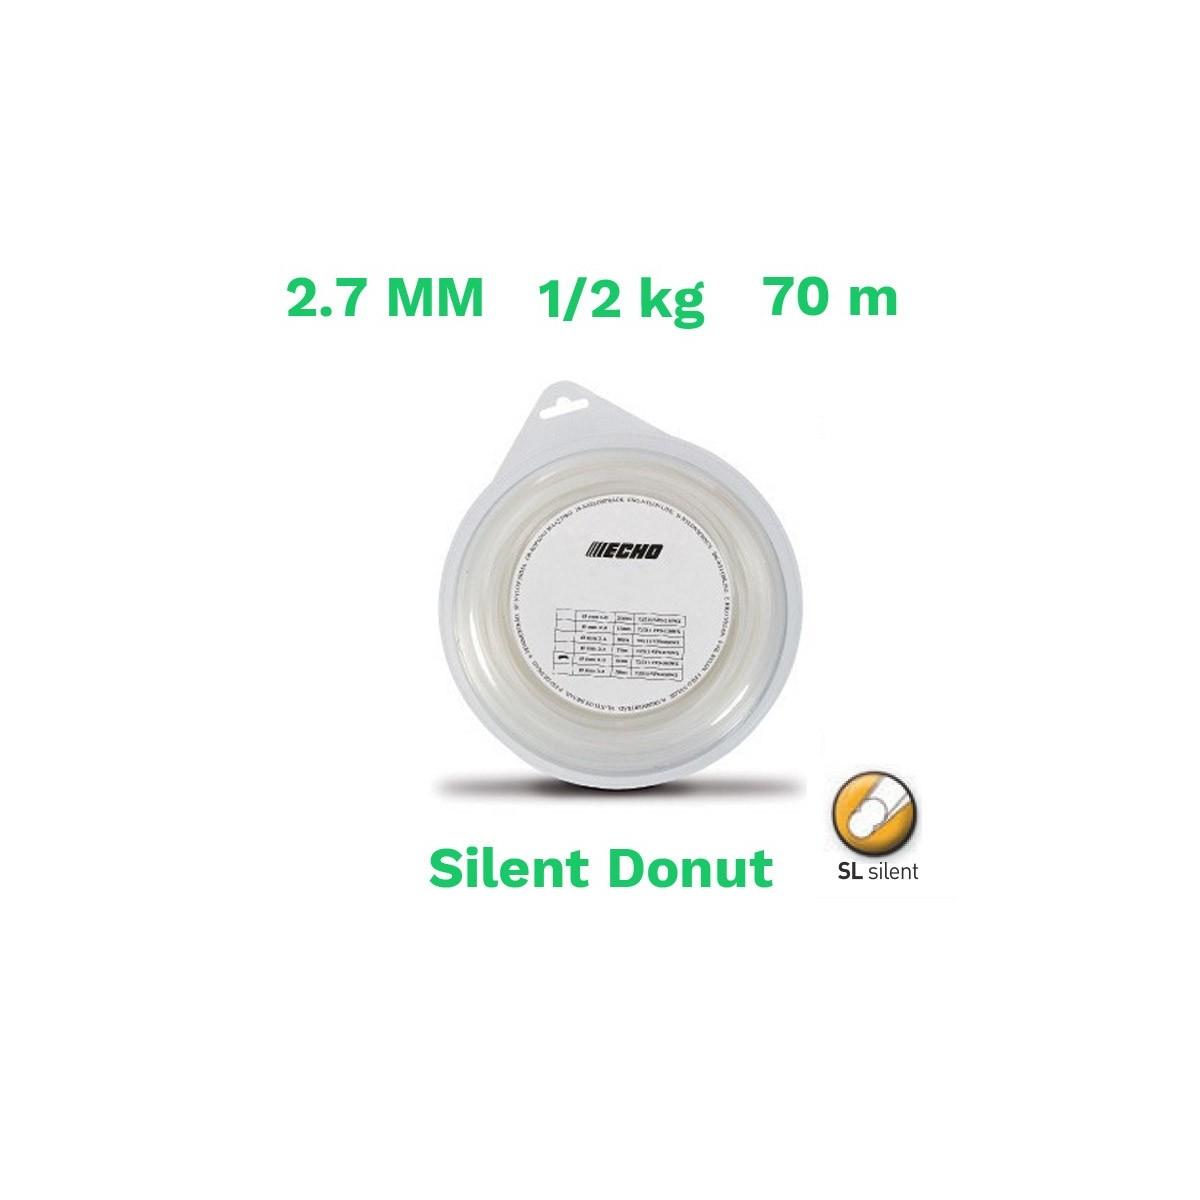 Echo hilo nylon silent donut 2.7mm 1/2 kg 70 m